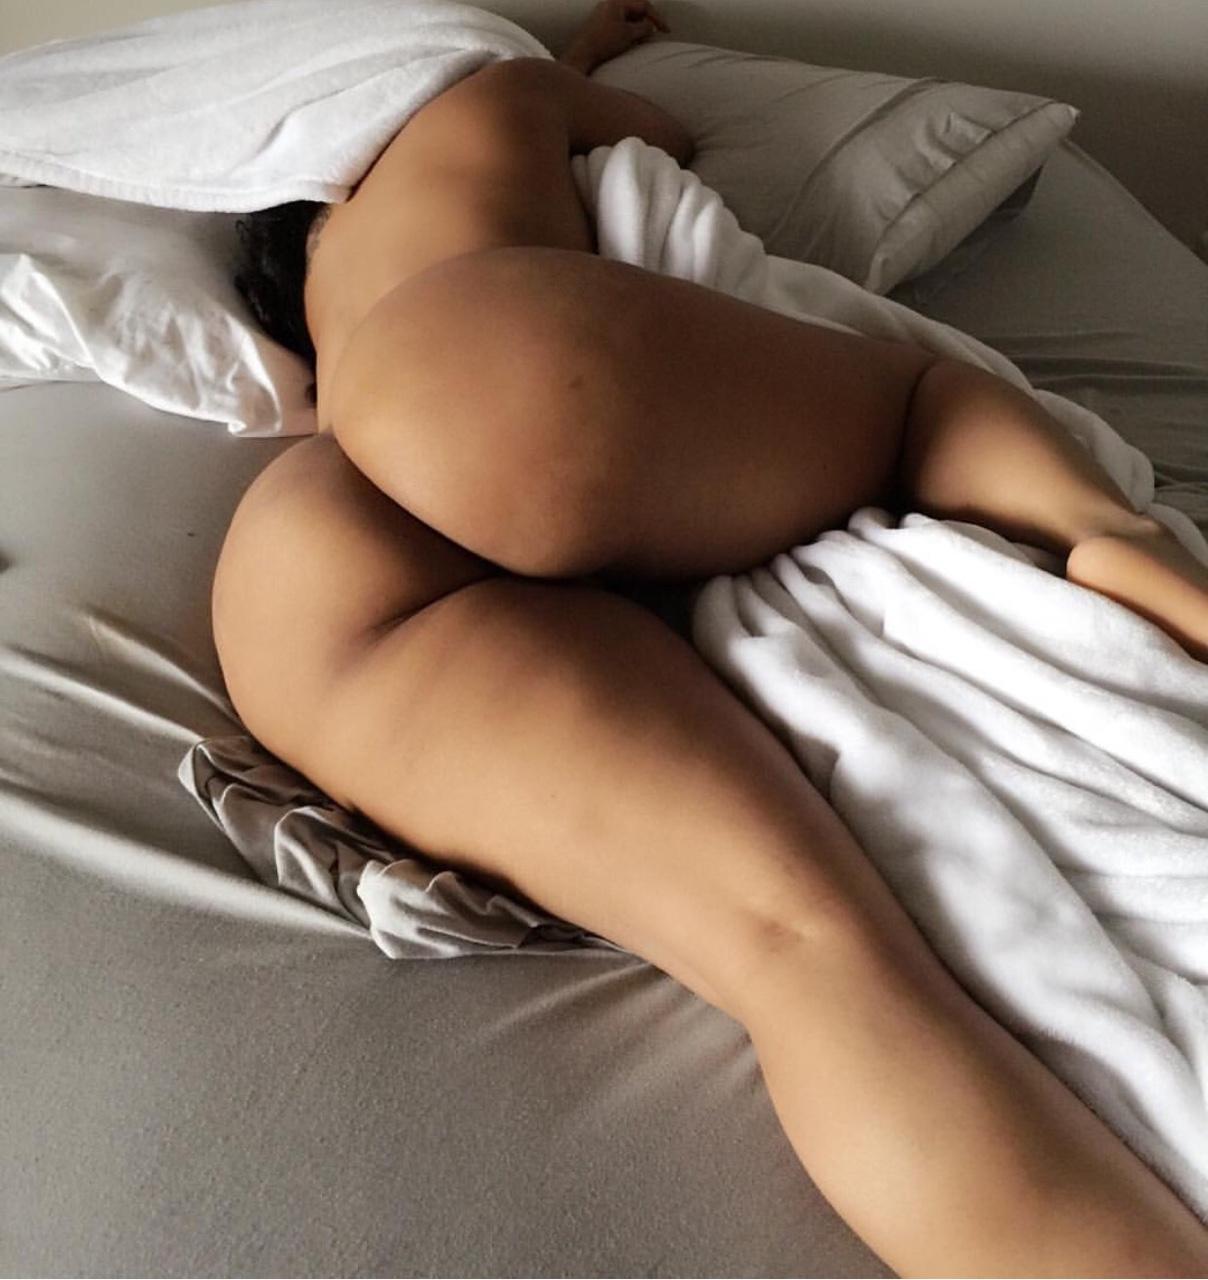 Thick Nude Woman Sleeping